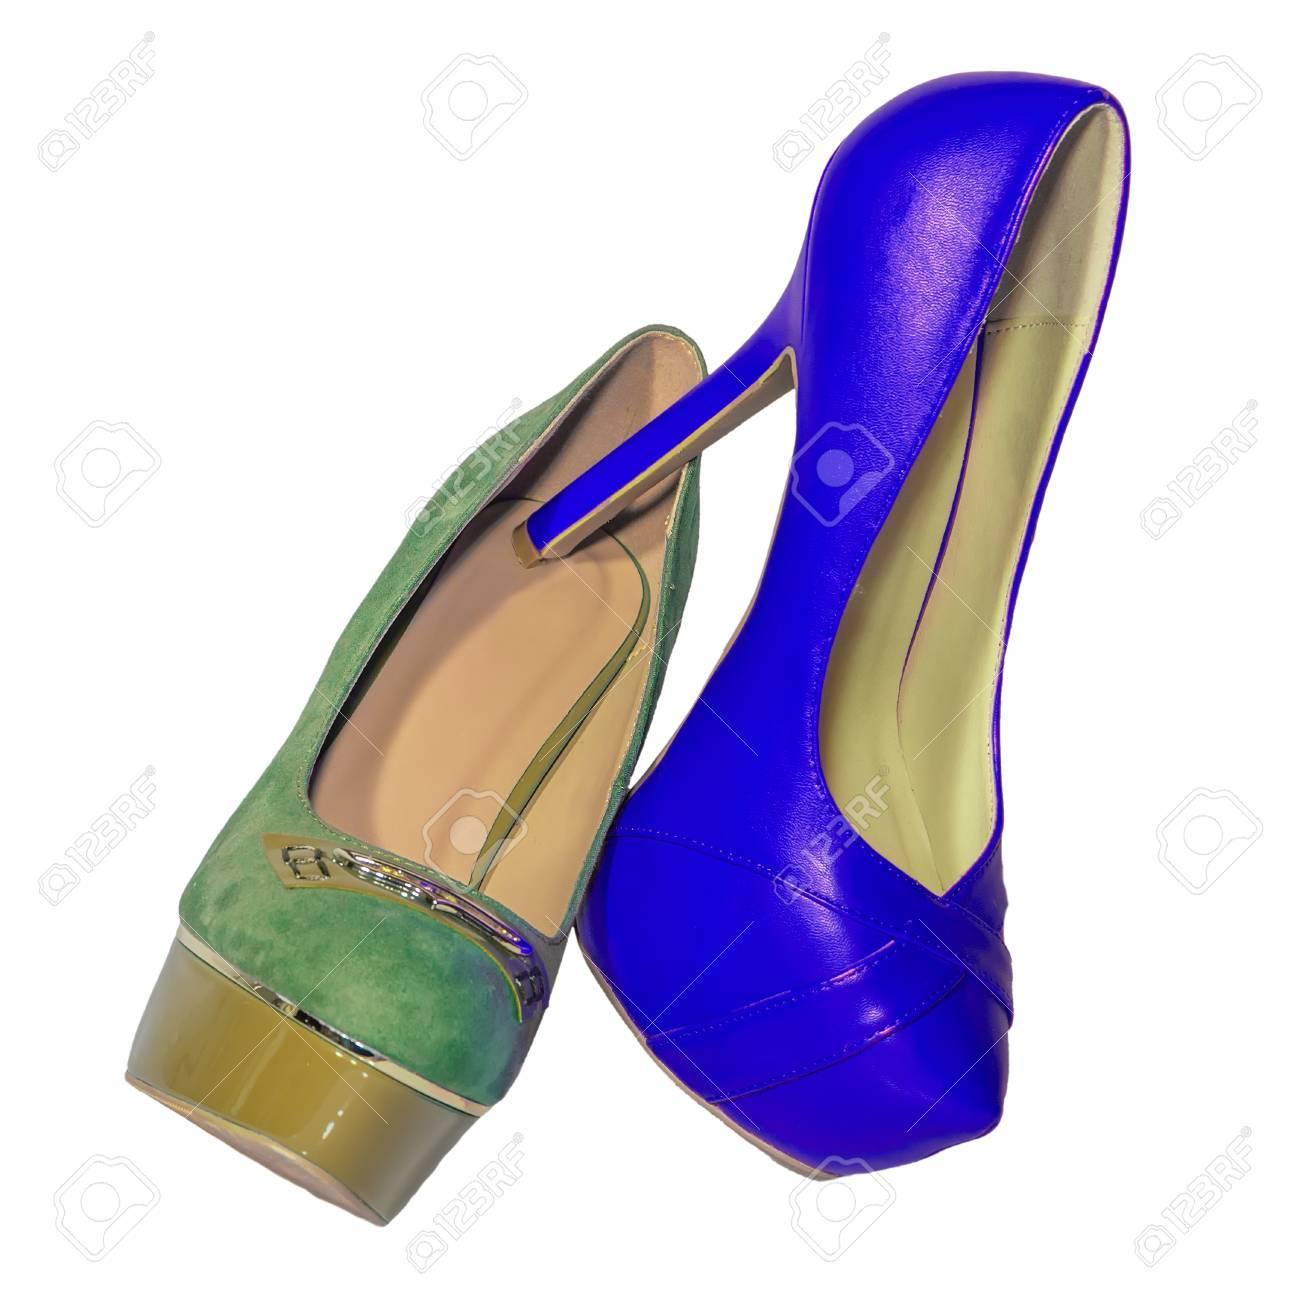 15852d632941 Zapatos de tacón alto para mujer conjunto aislado verde azul de fondo blanco